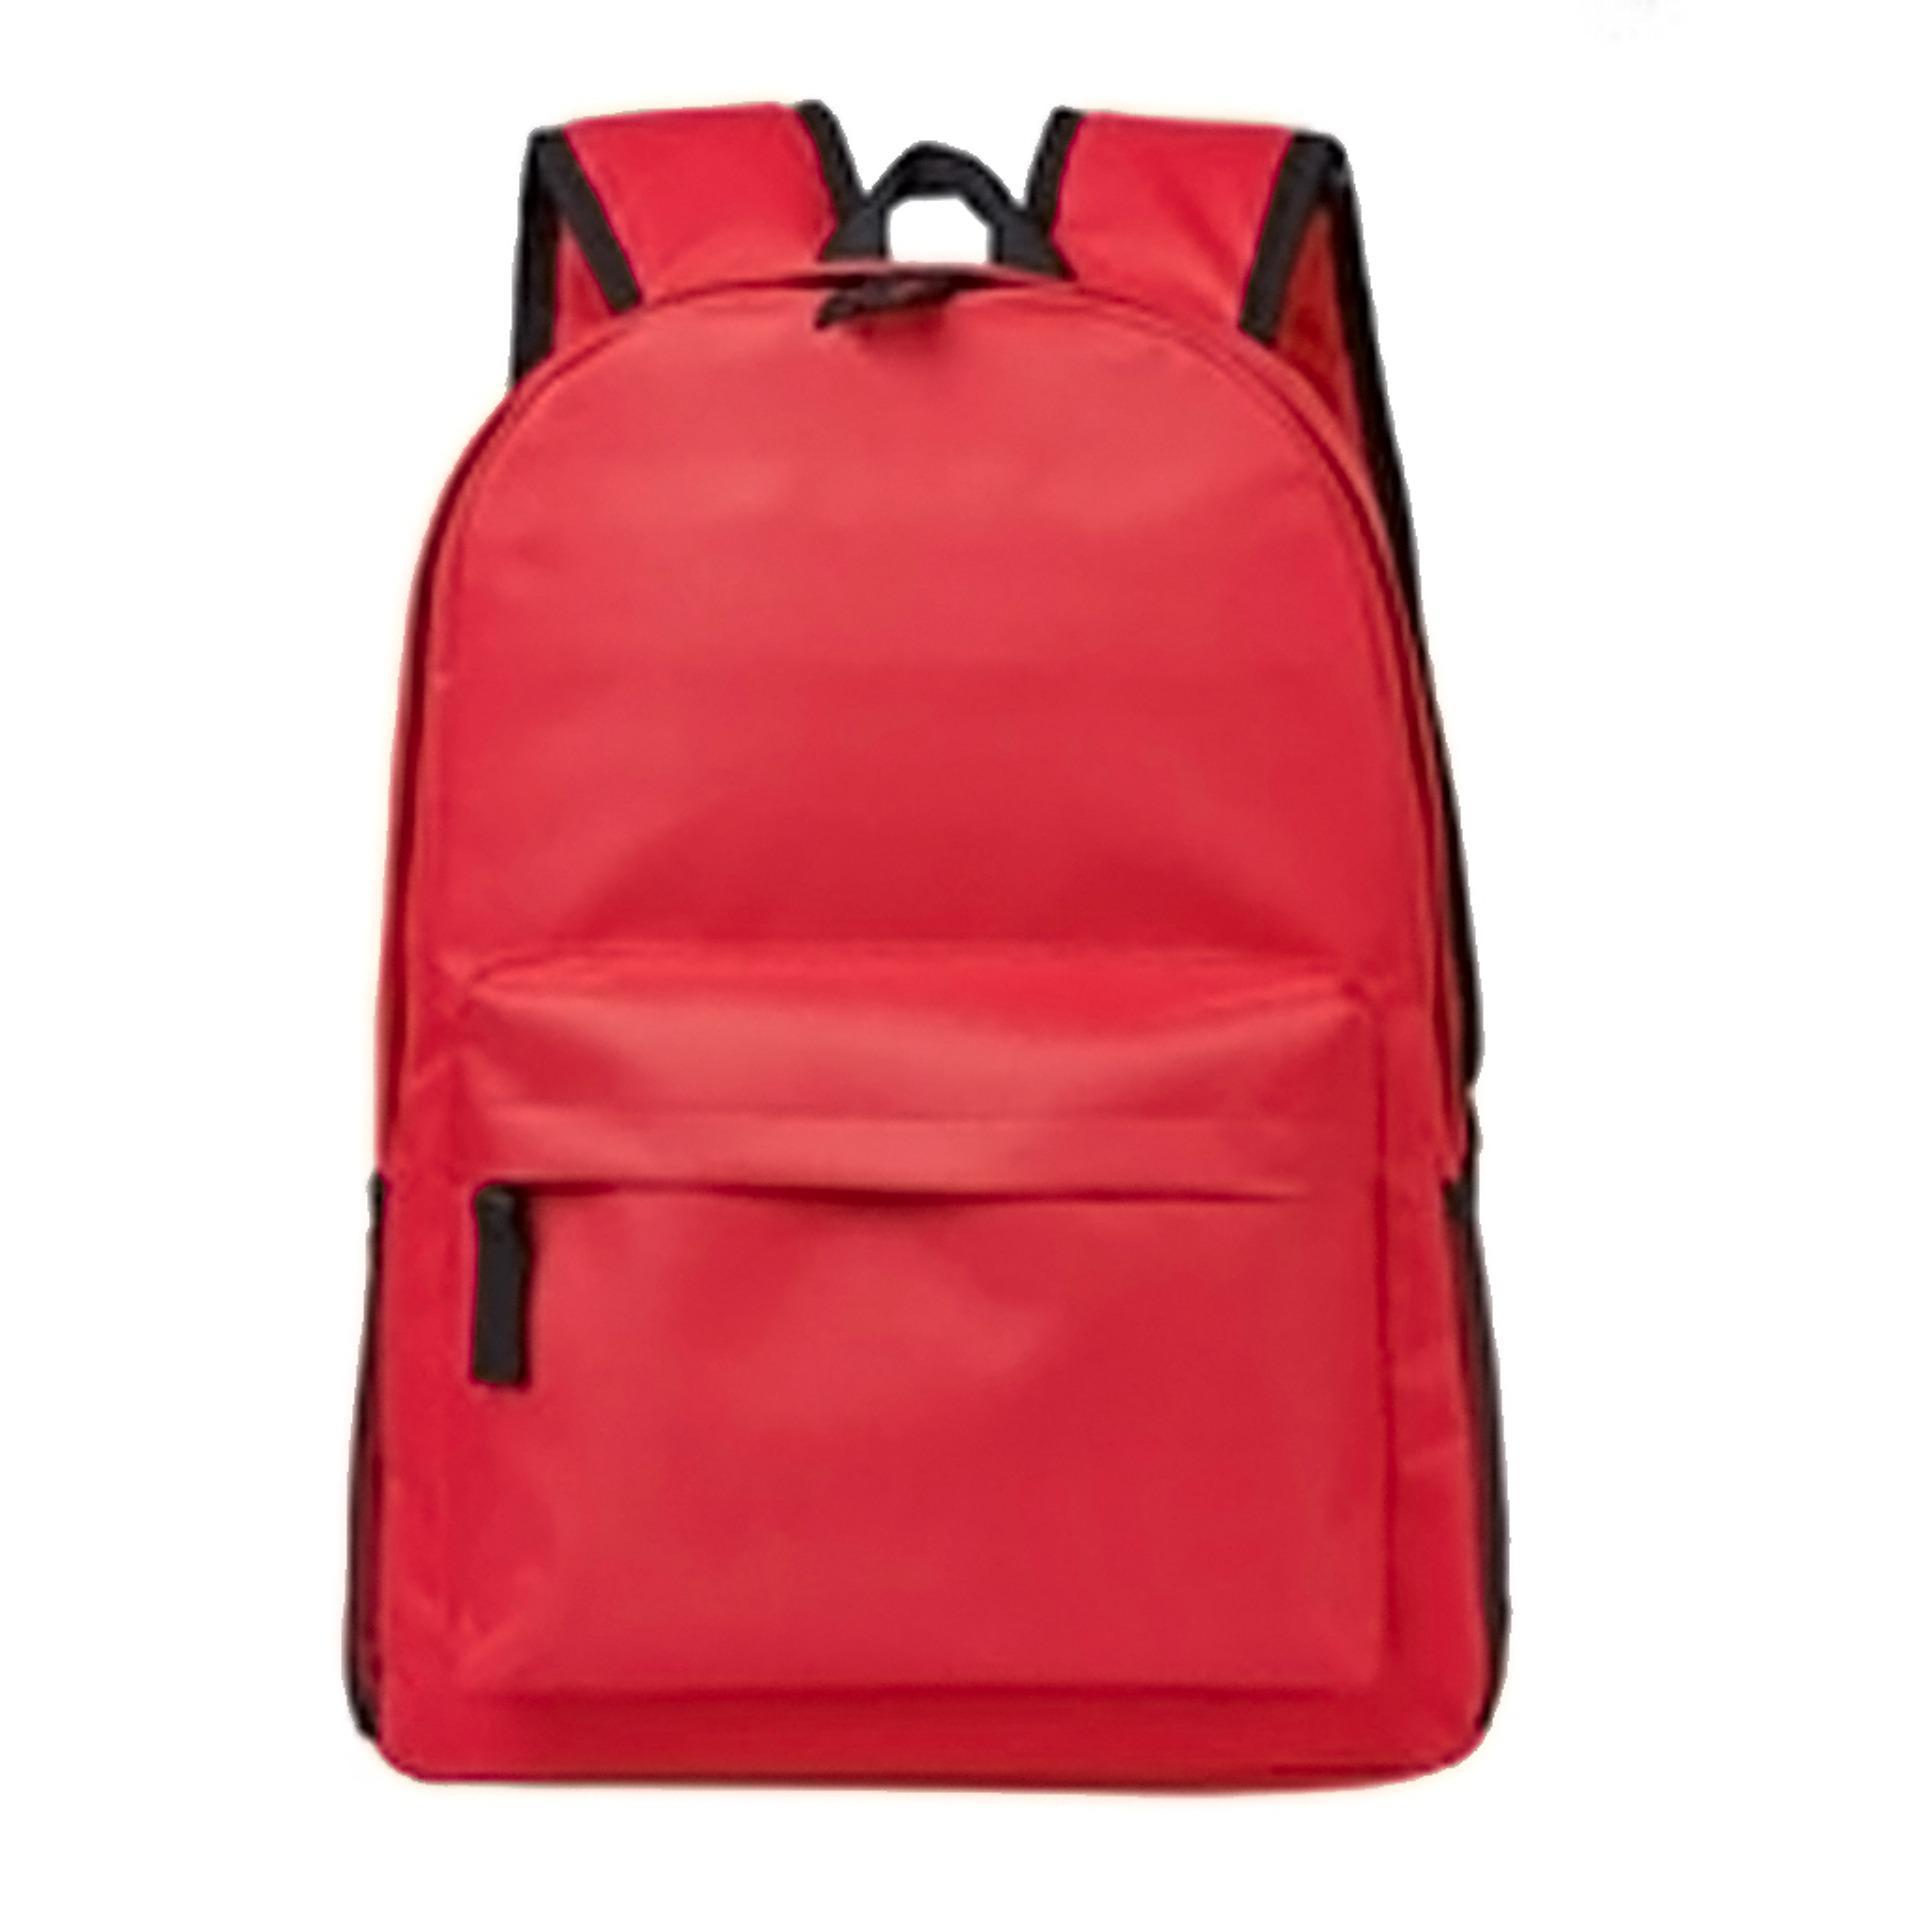 size   42cmx32cmx15cm Tas Fashion Import   Tas Ransel   Tas Punggung    Backpack   Travel Bag - Wanita d3d66129ad